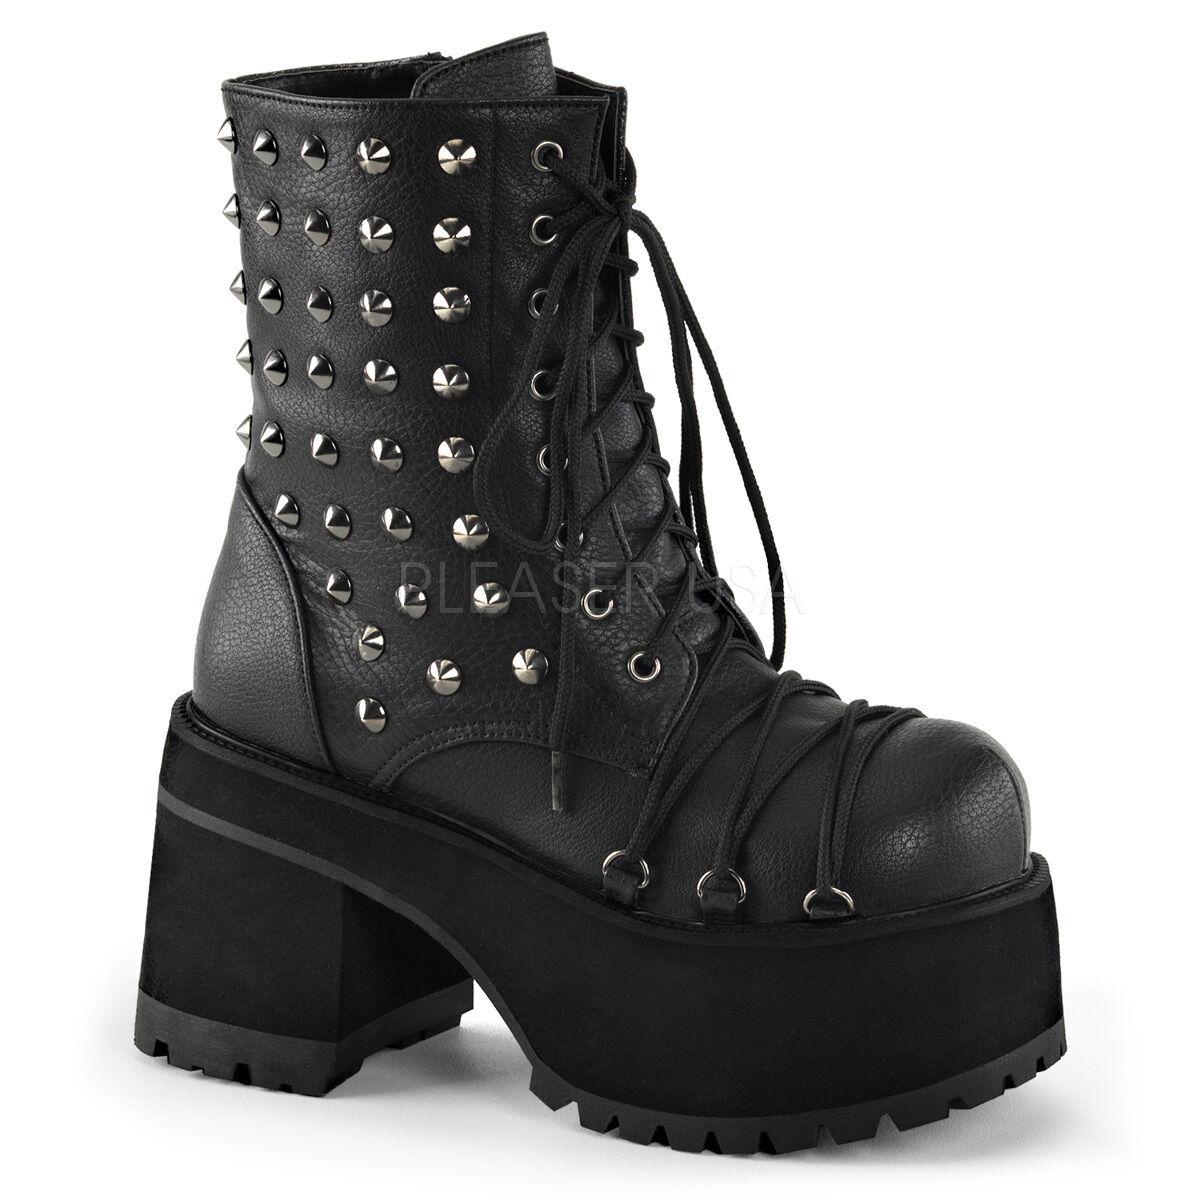 Demonia ran208 bpu Para Mujer Plataforma Spike Stud lazada Goth Botines Zapatos